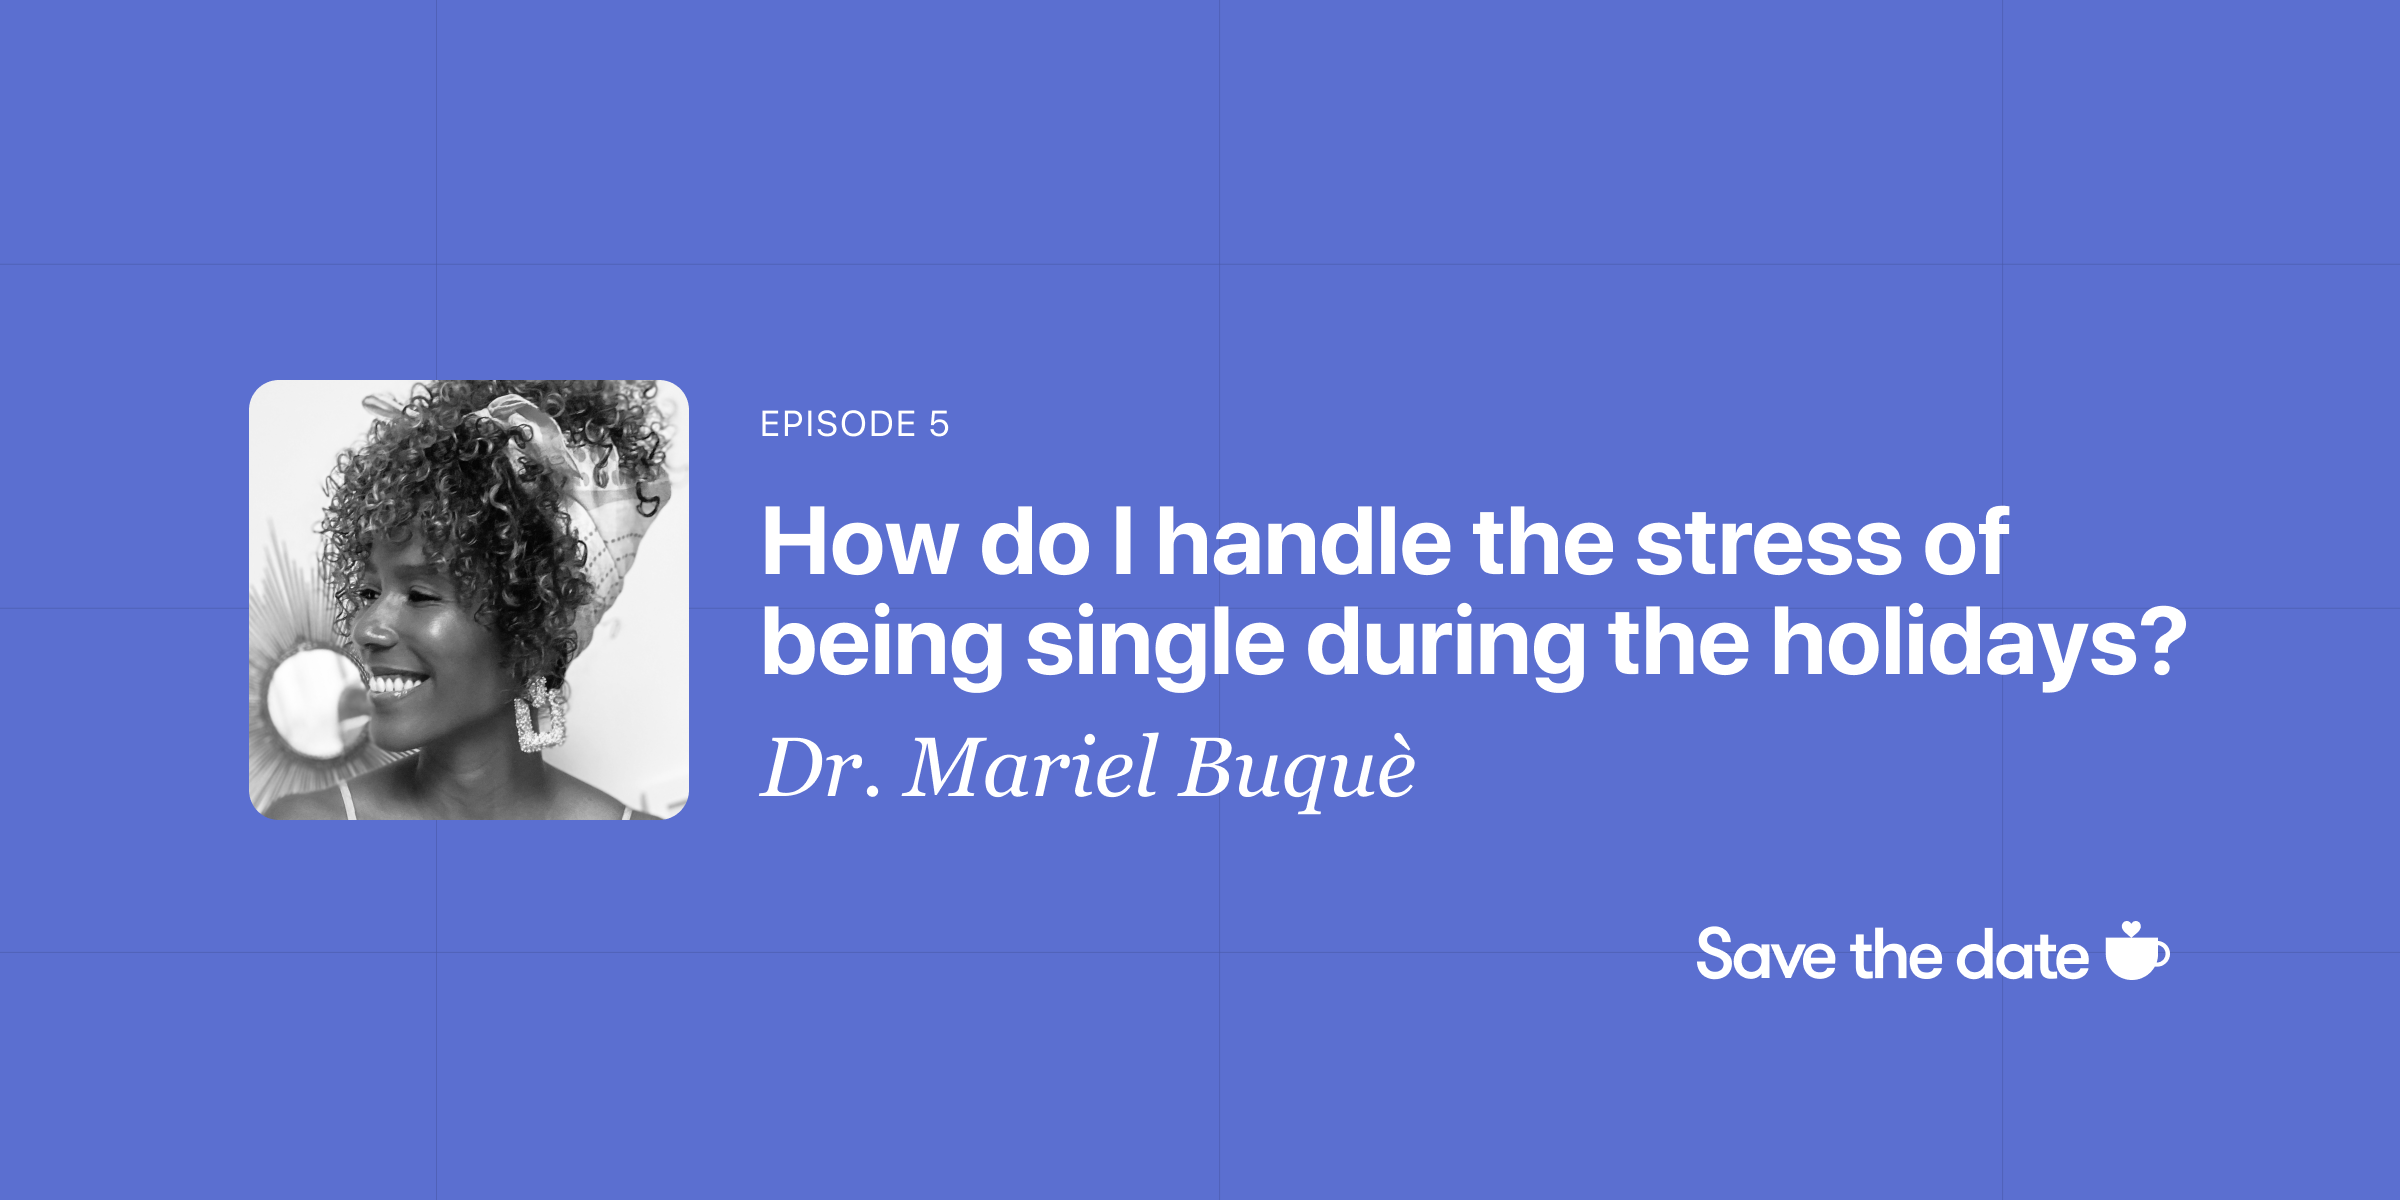 Dr. Mariel Buque, Episode 5